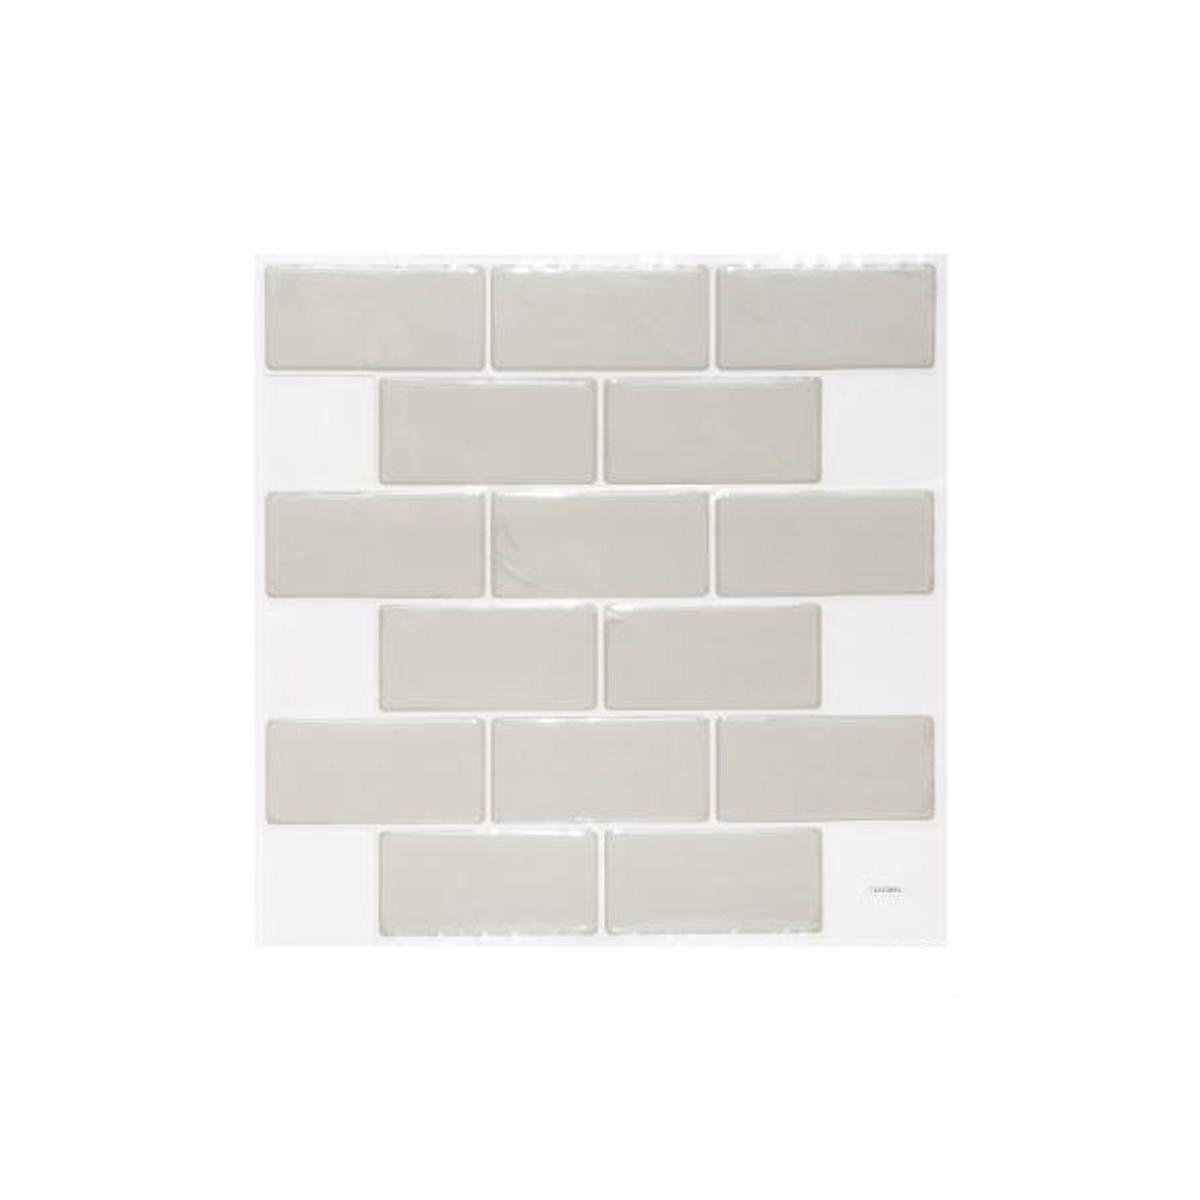 Sticker briques carrelage blanches